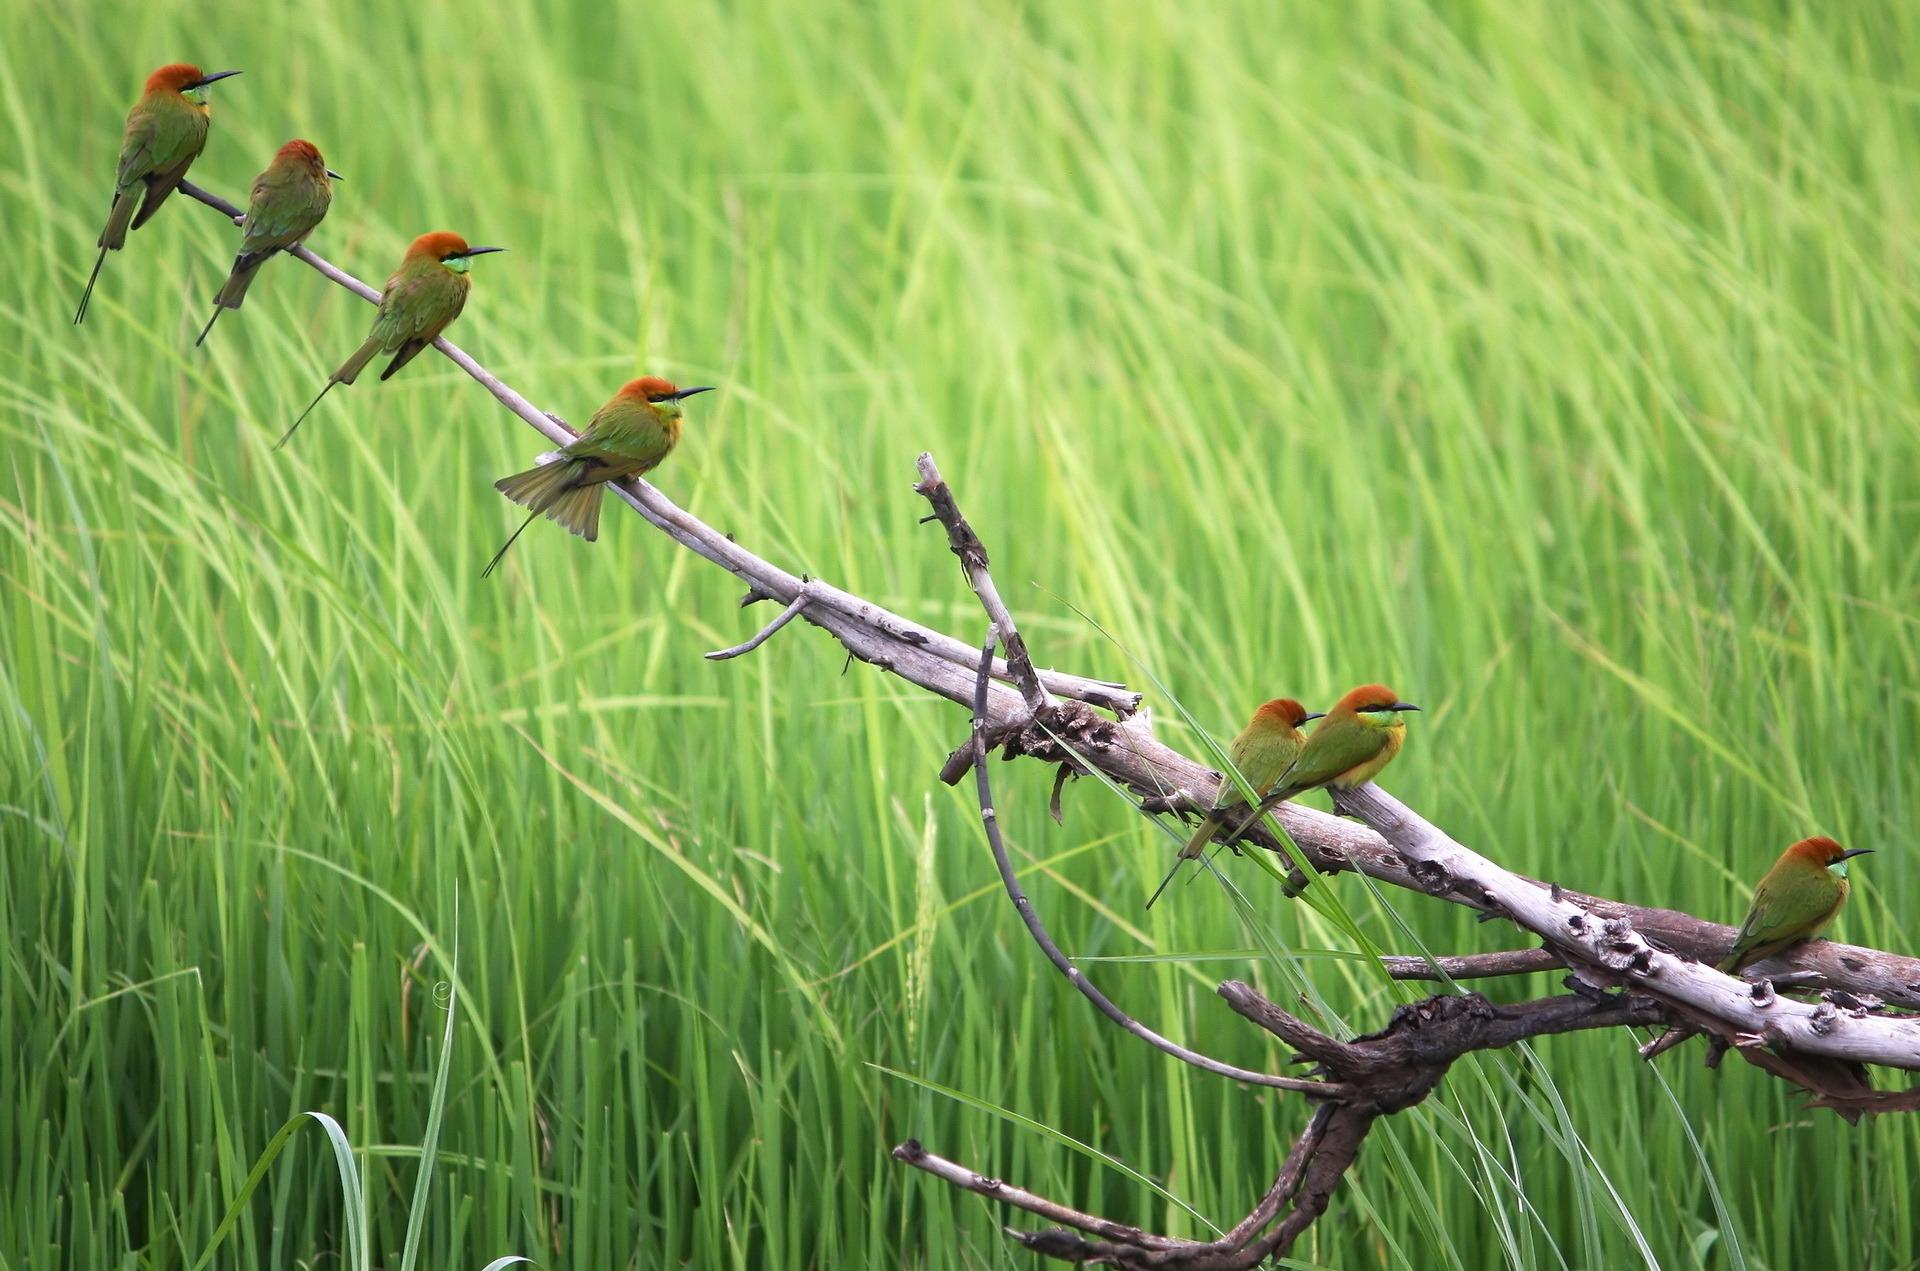 фотографии после картинка поляна птиц природа